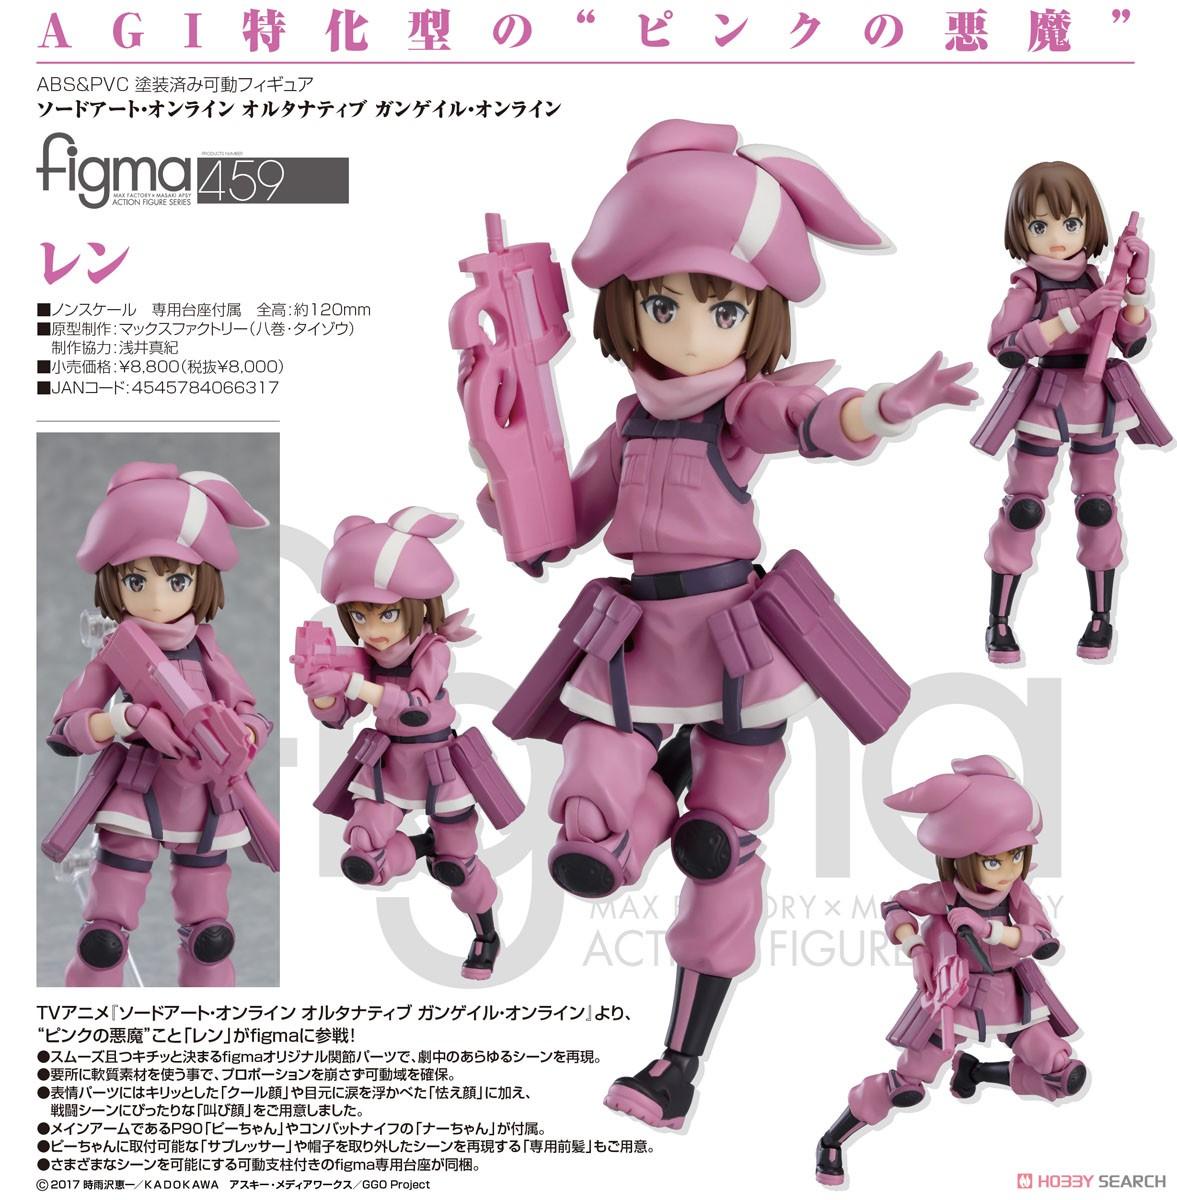 figma『レン』ソードアート・オンライン オルタナティブ ガンゲイル・オンライン 可動フィギュア-006